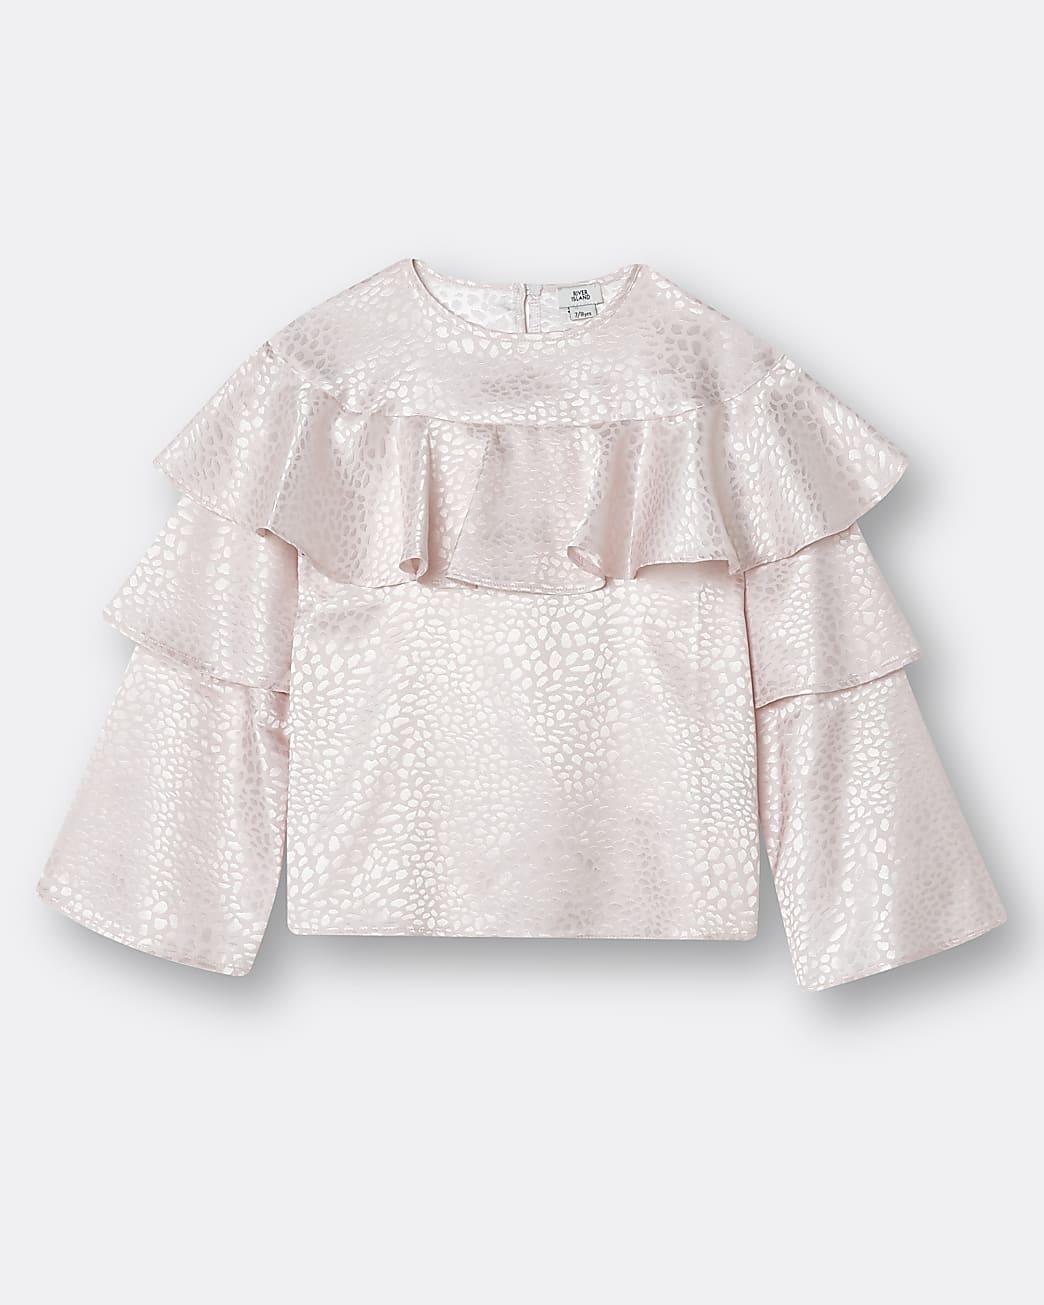 Girls pink ruffle blouse top